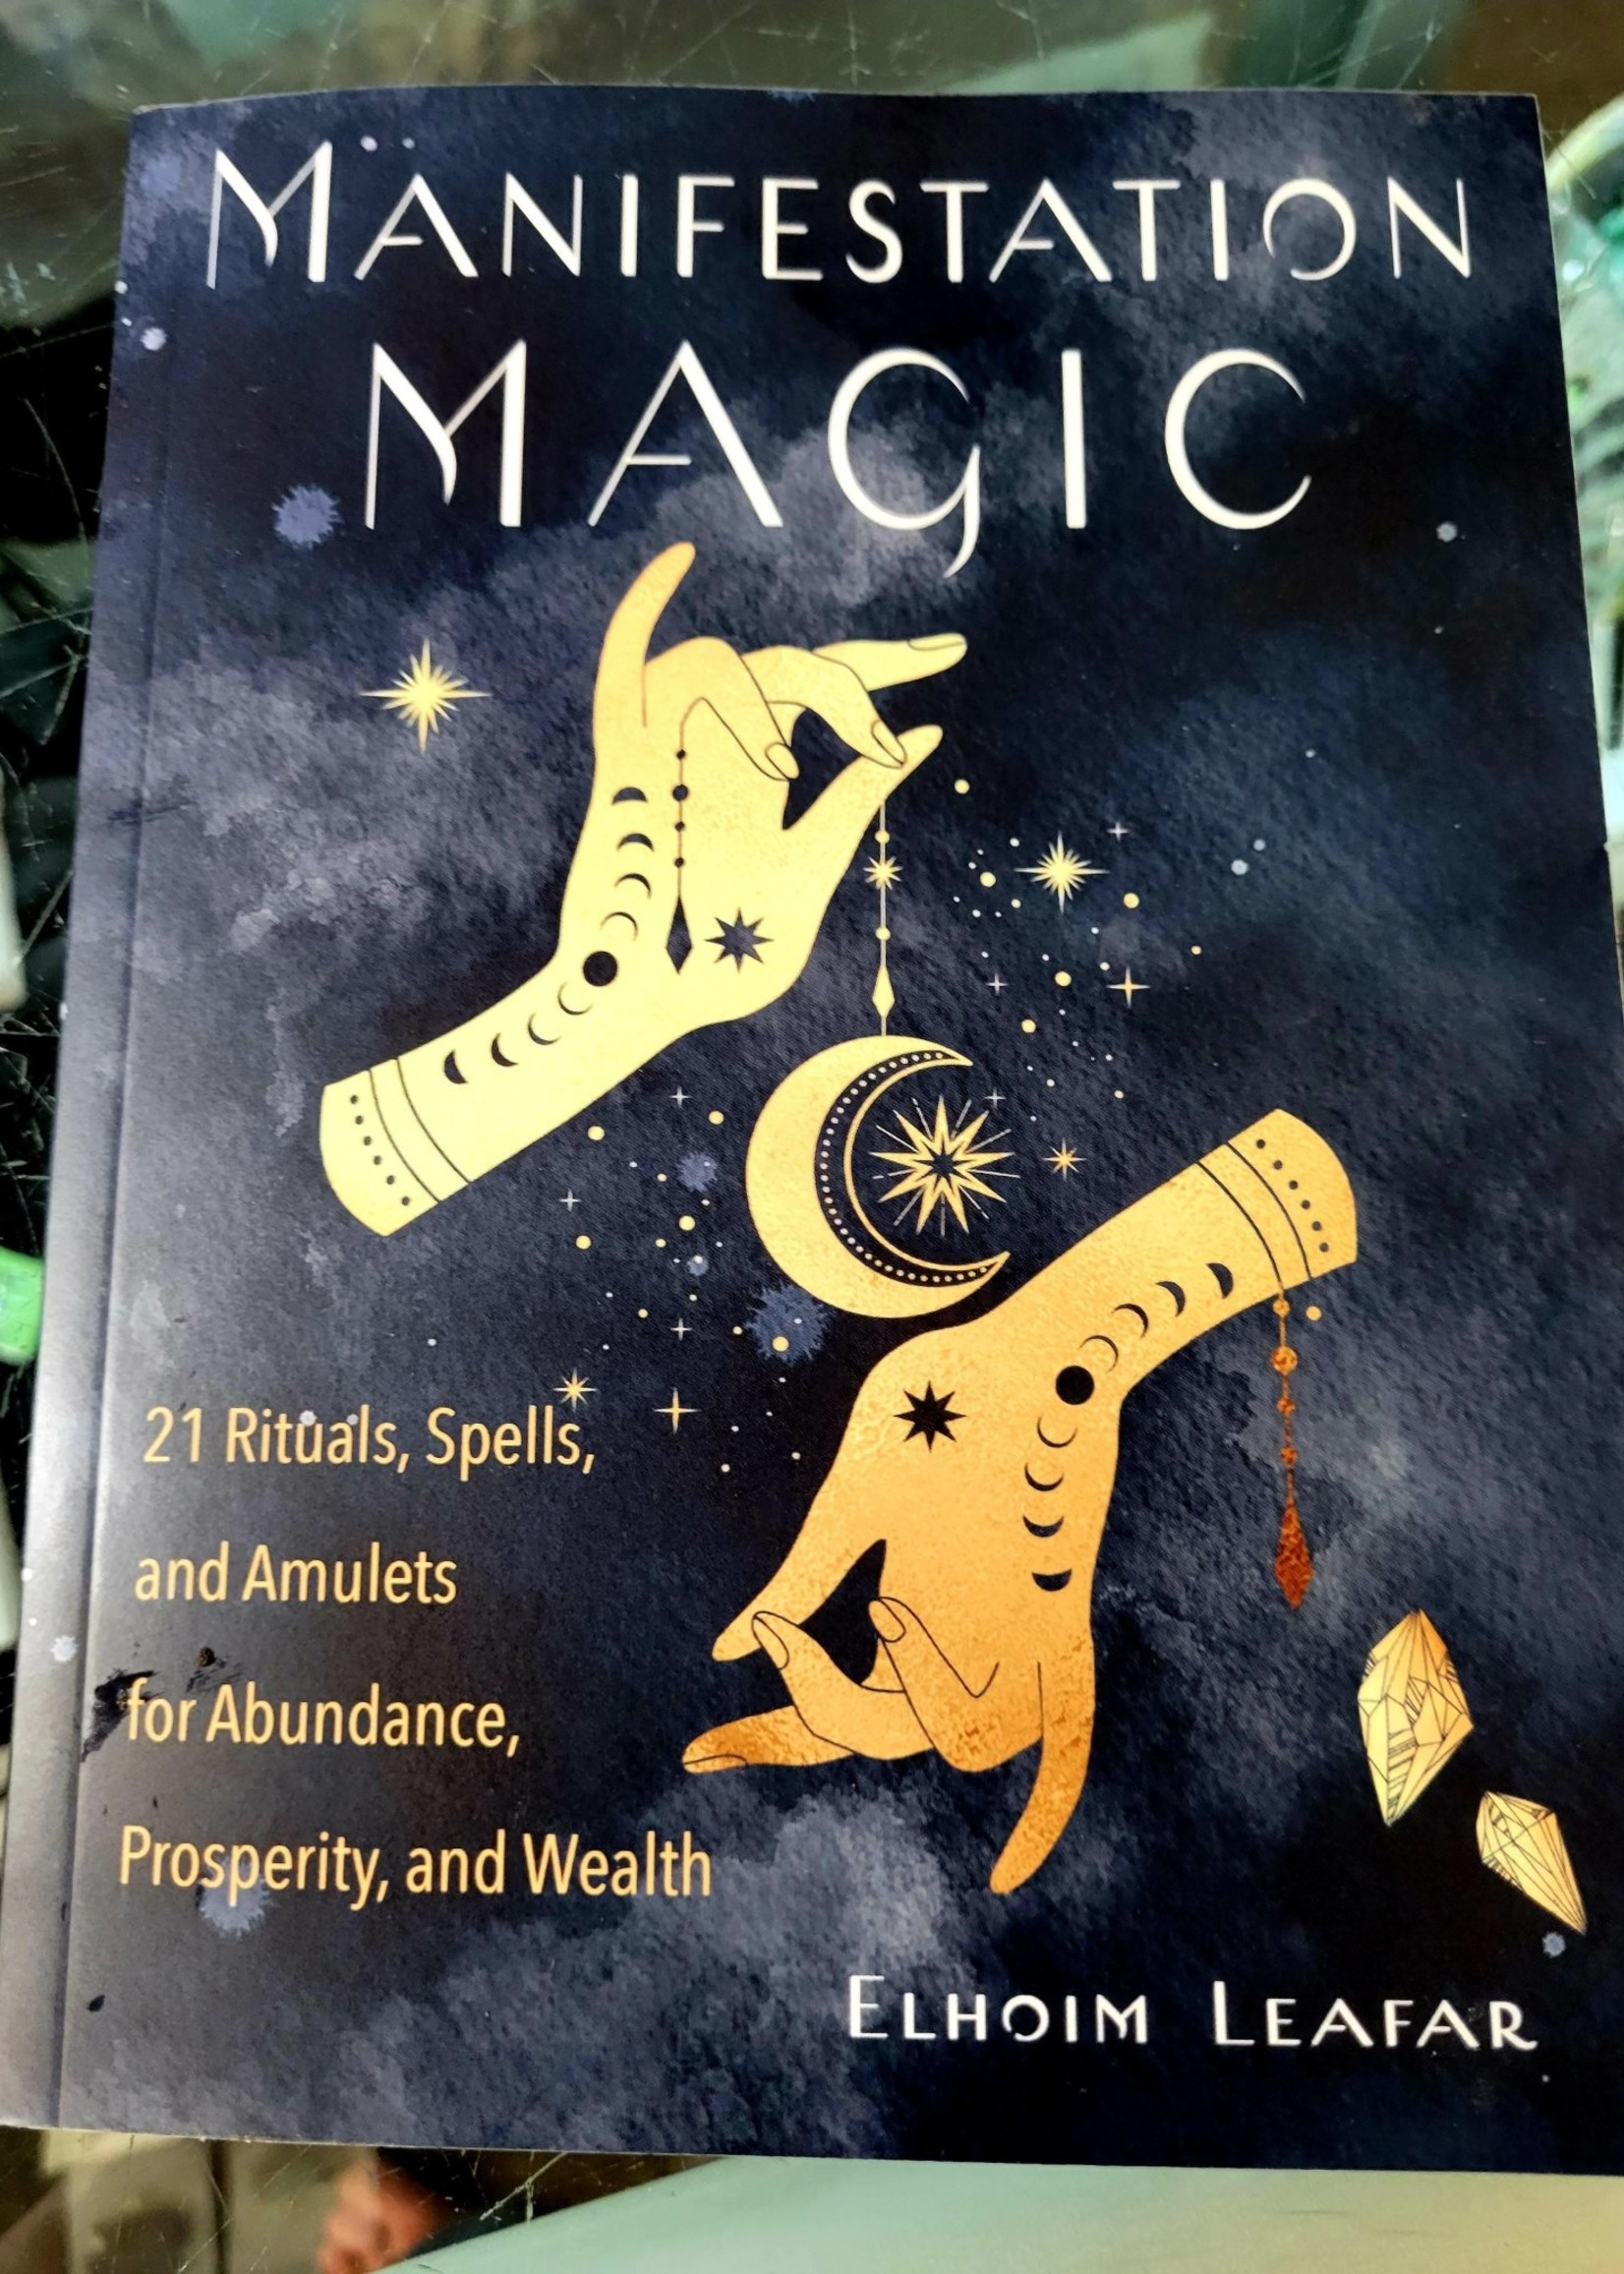 Manifestation Magic 21 Rituals, Spells, and Amulets for Abundance, Prosperity, and Wealth -  Elhoim Leafar